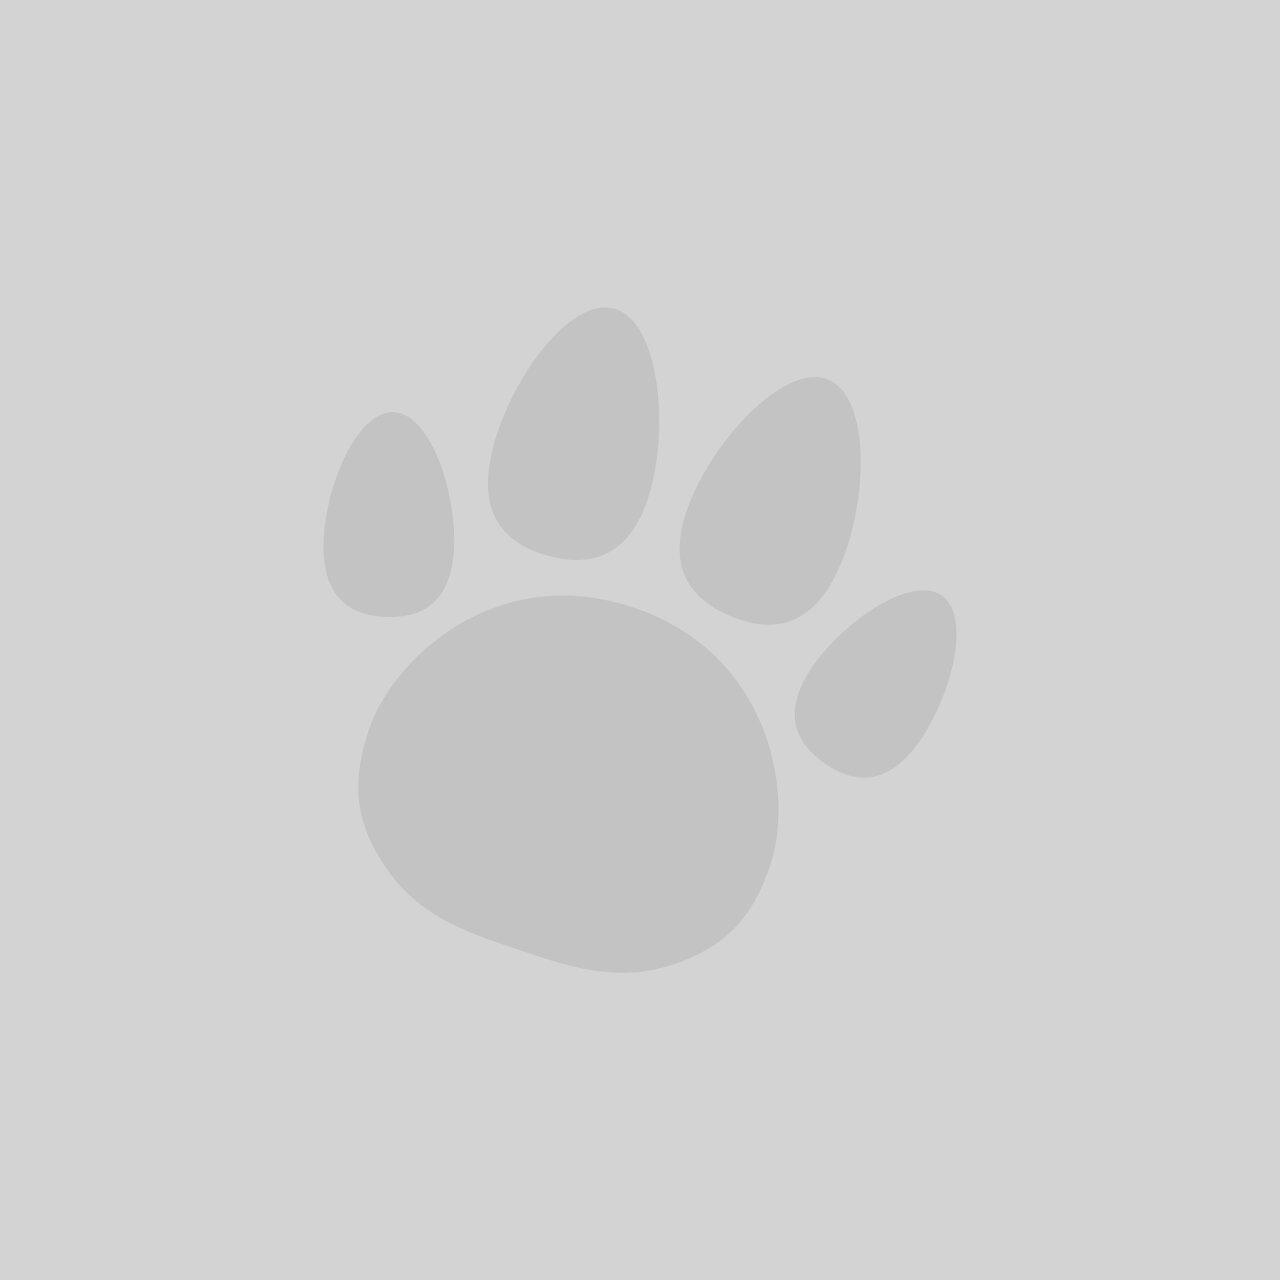 James Wellbeloved Dog Adult Cereal Free Turkey & Vegetables (Size Options Available)